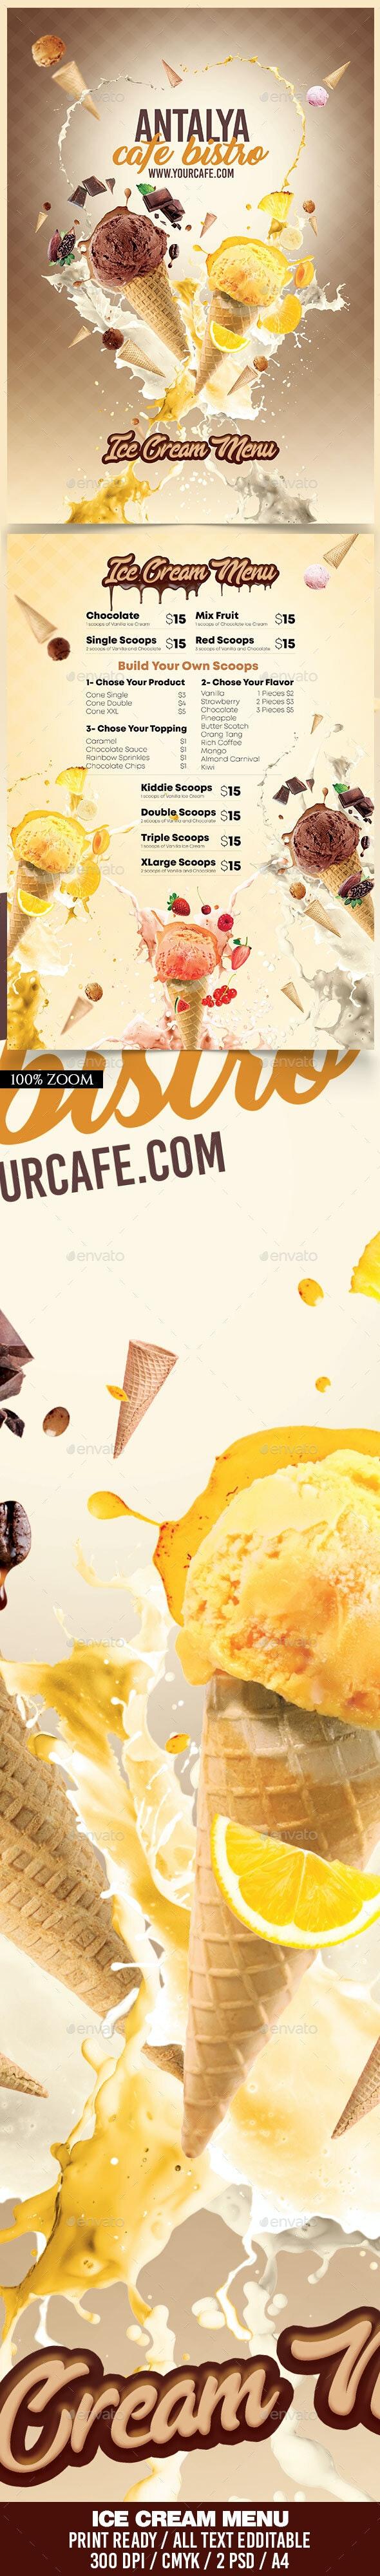 A4 Ice Cream Menu - Food Menus Print Templates